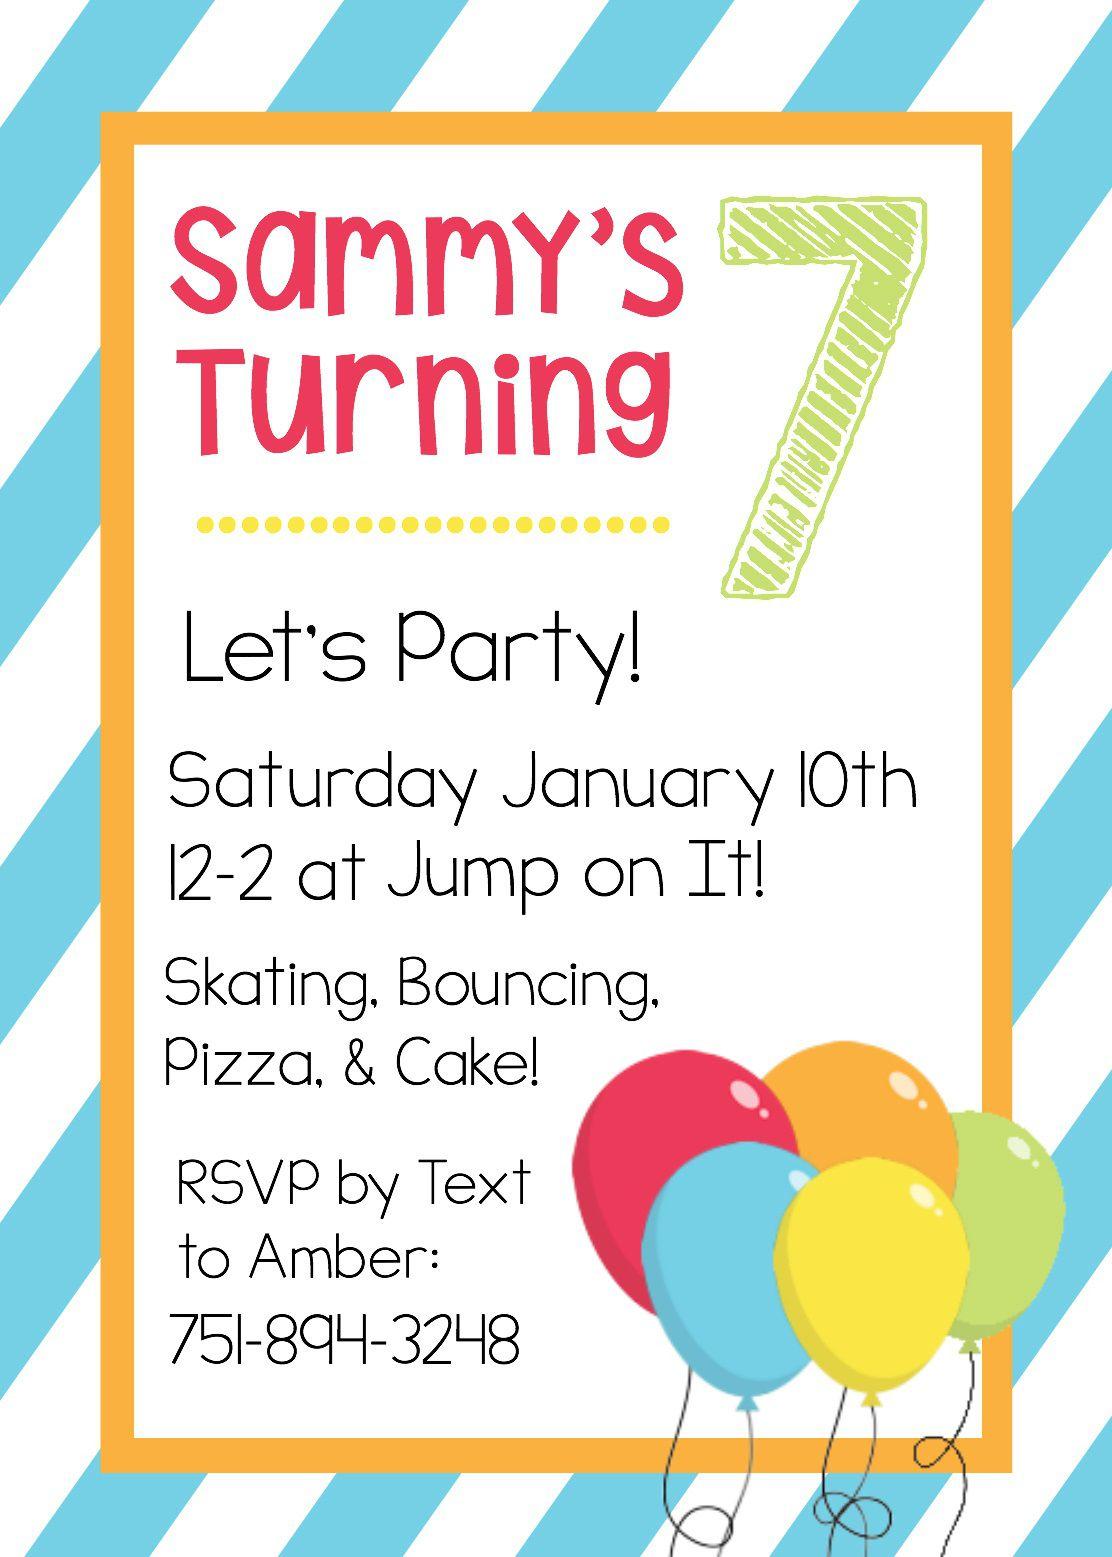 005 Imposing Free Birthday Party Invitation Template Design  Templates Printable 16th Australia UkFull